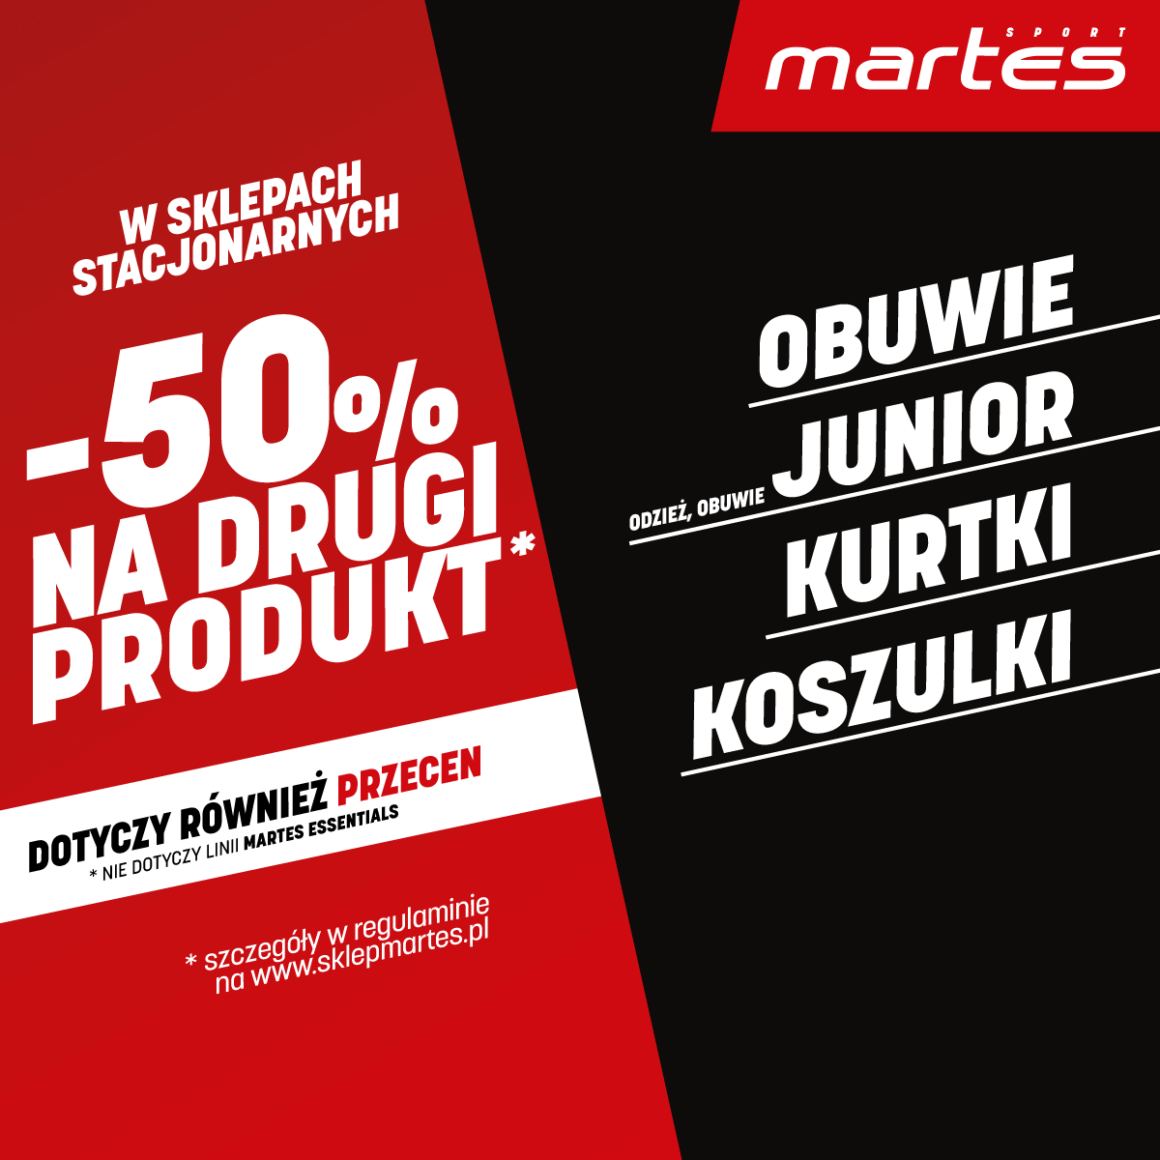 -50% NA DRUGI PRODUKT W SALONACH  MARTES SPORT